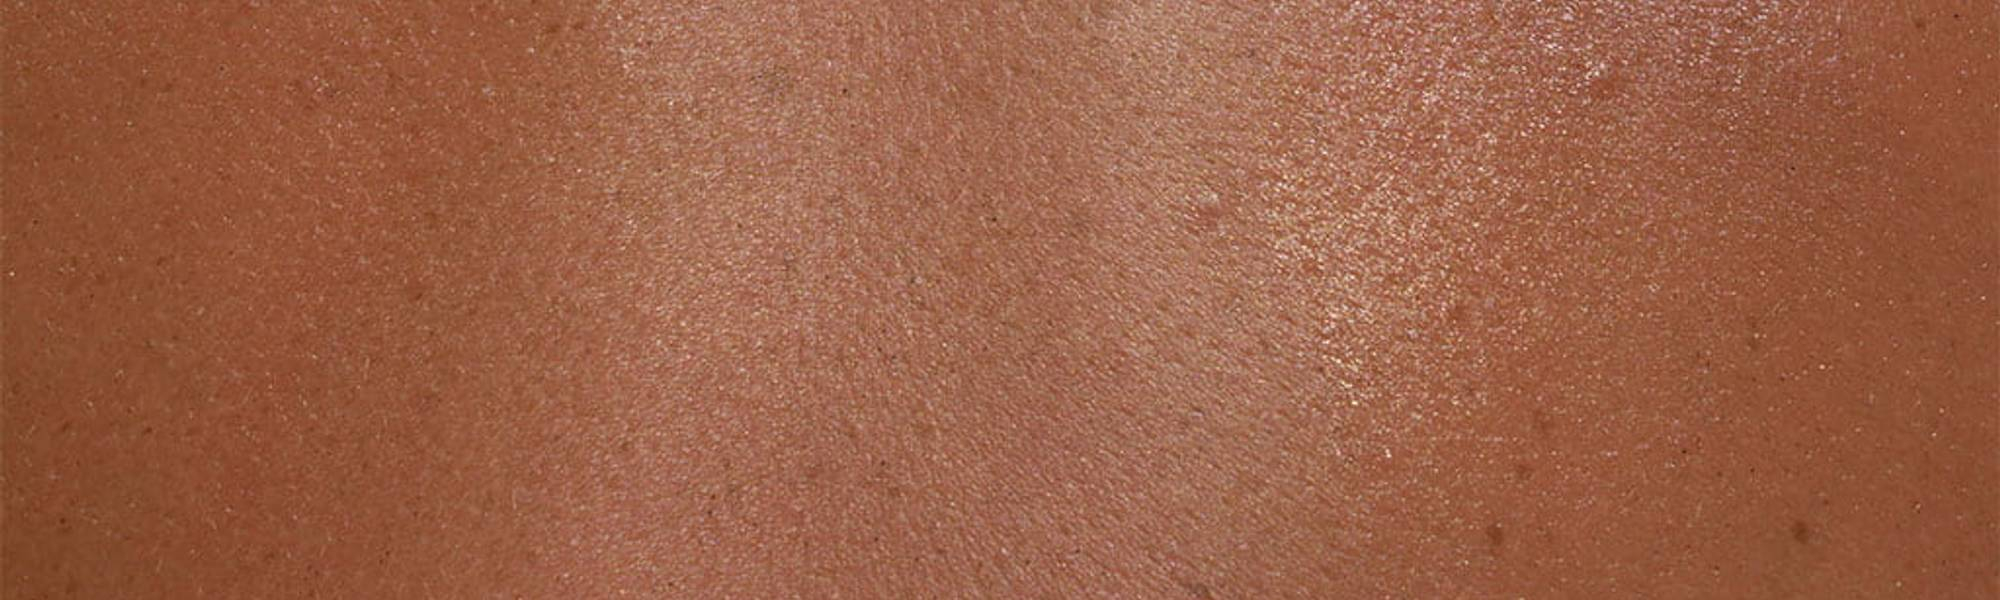 Alergiczna Alergia skórna skóra wrażliwa i | La Roche Posay